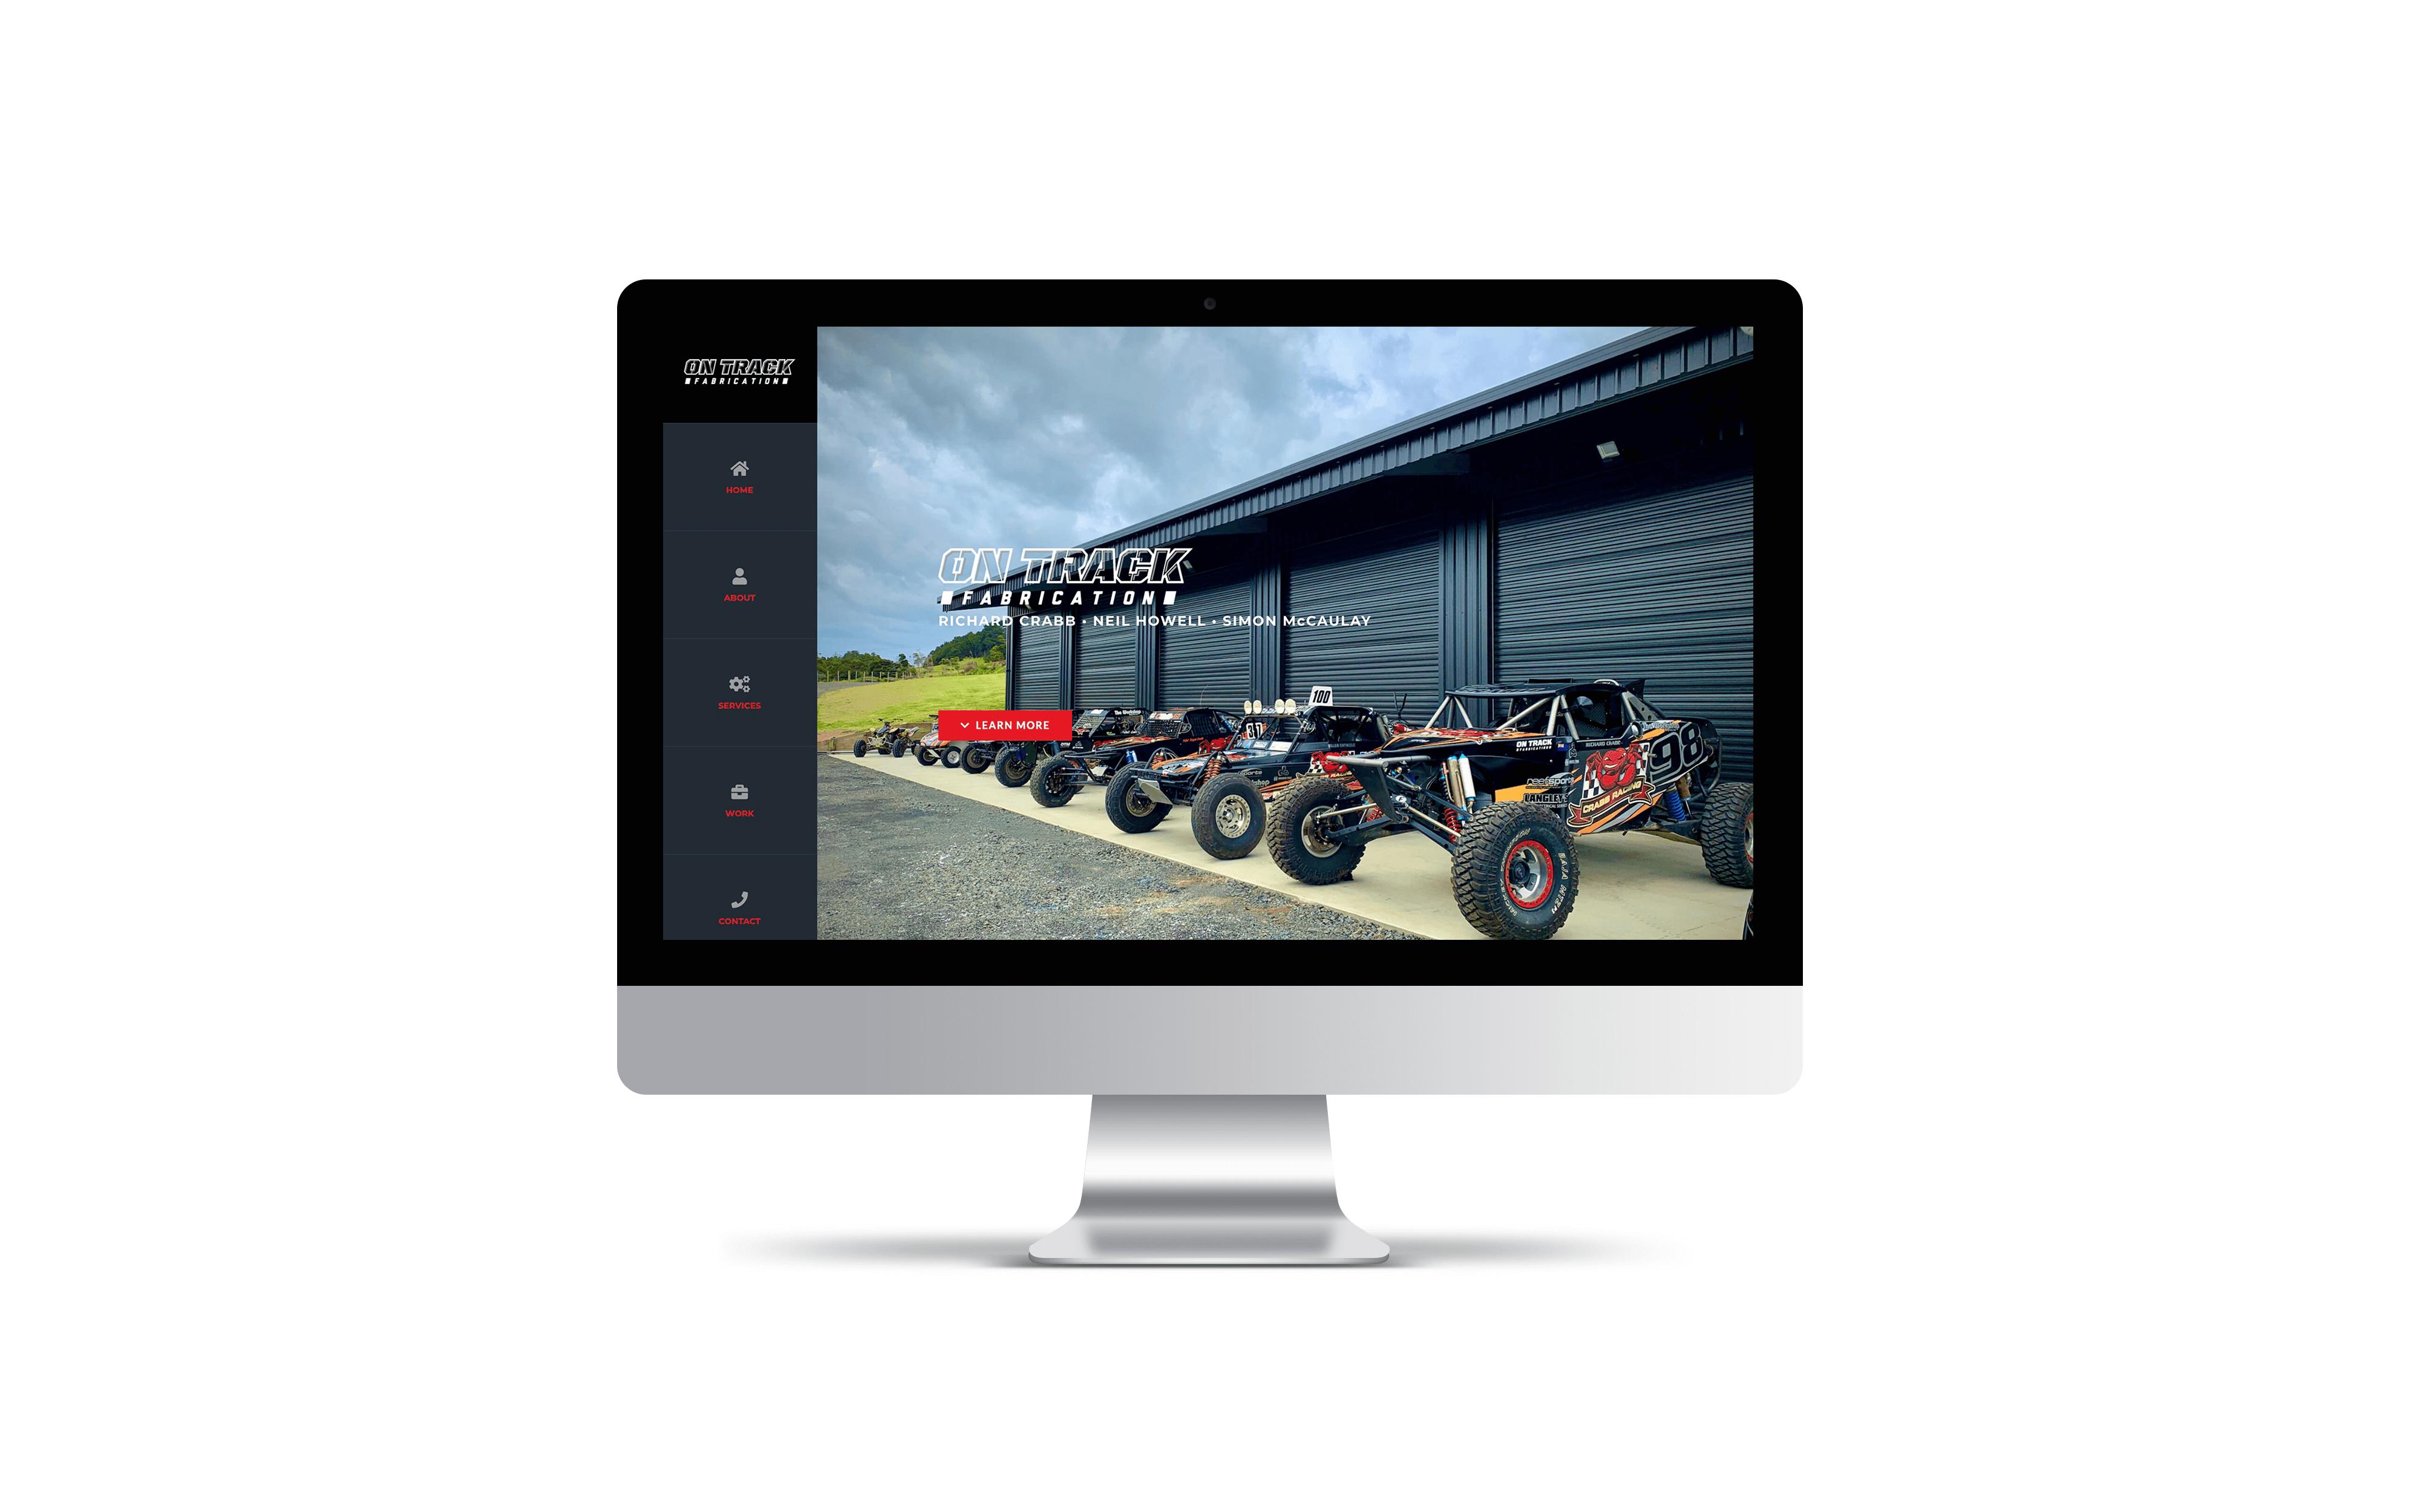 Website: On Track Fabrication